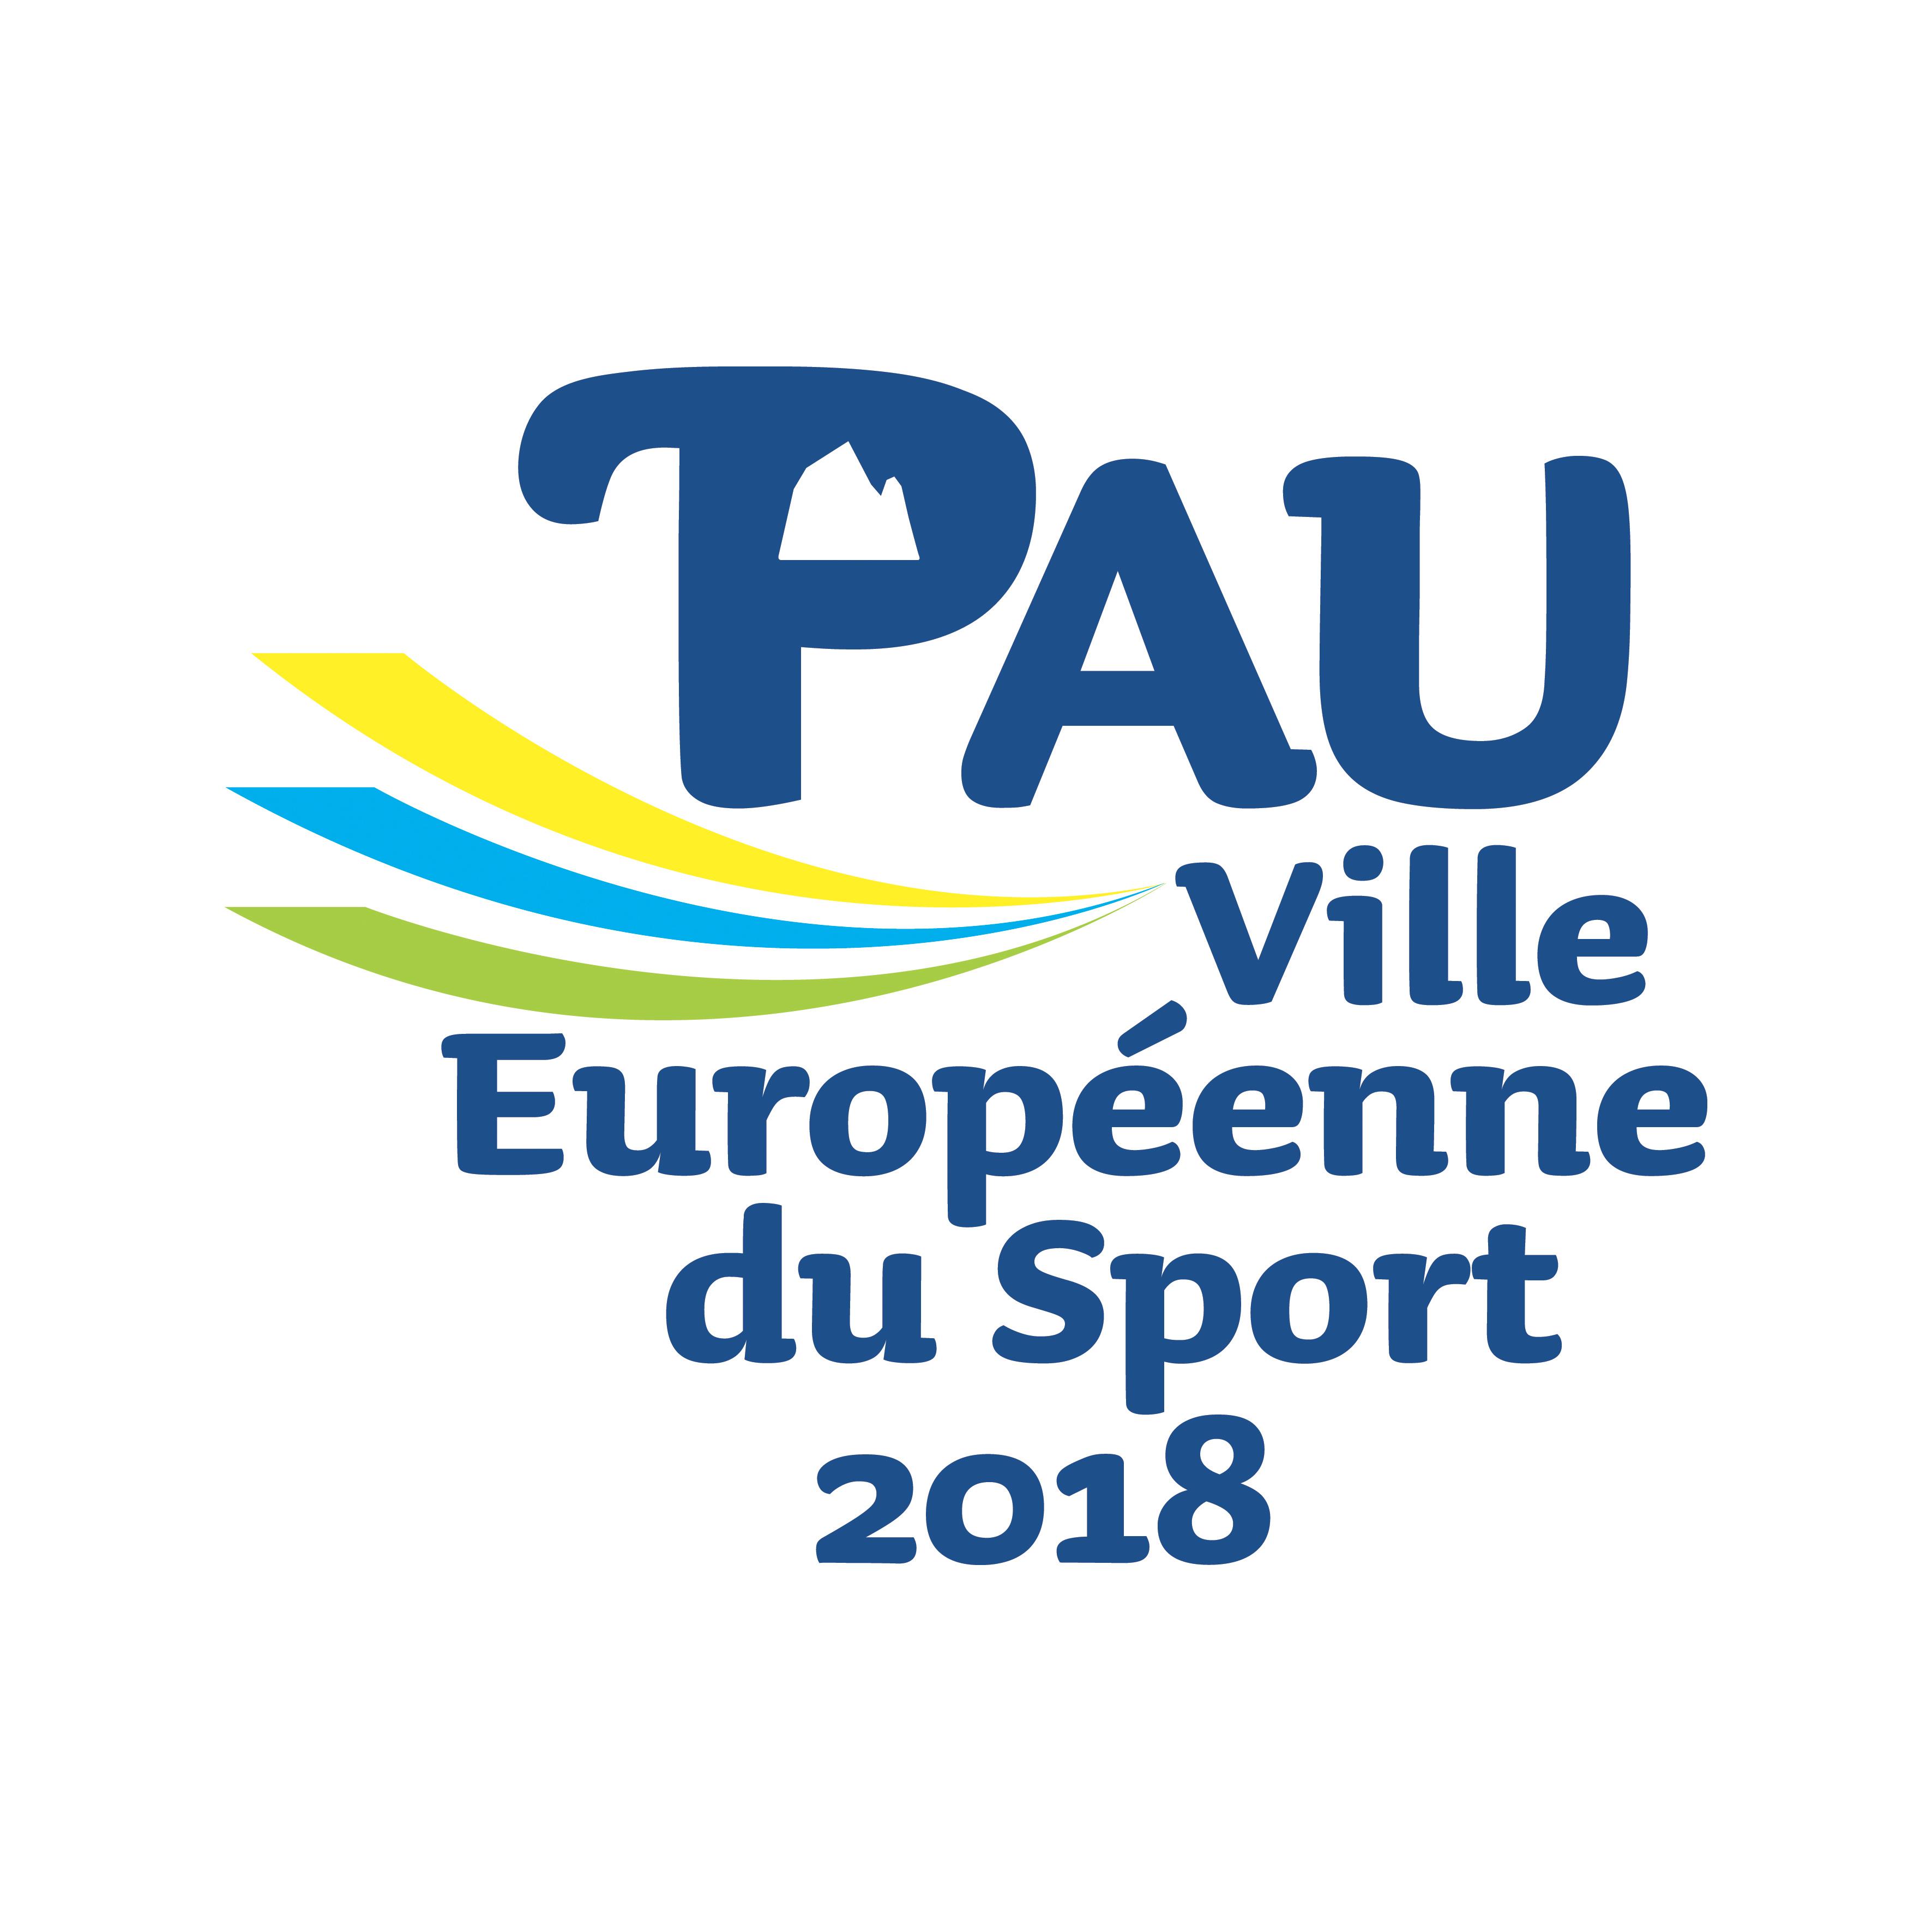 PAU VILLE EUROPEENNE DU SPORT 2018 RVB